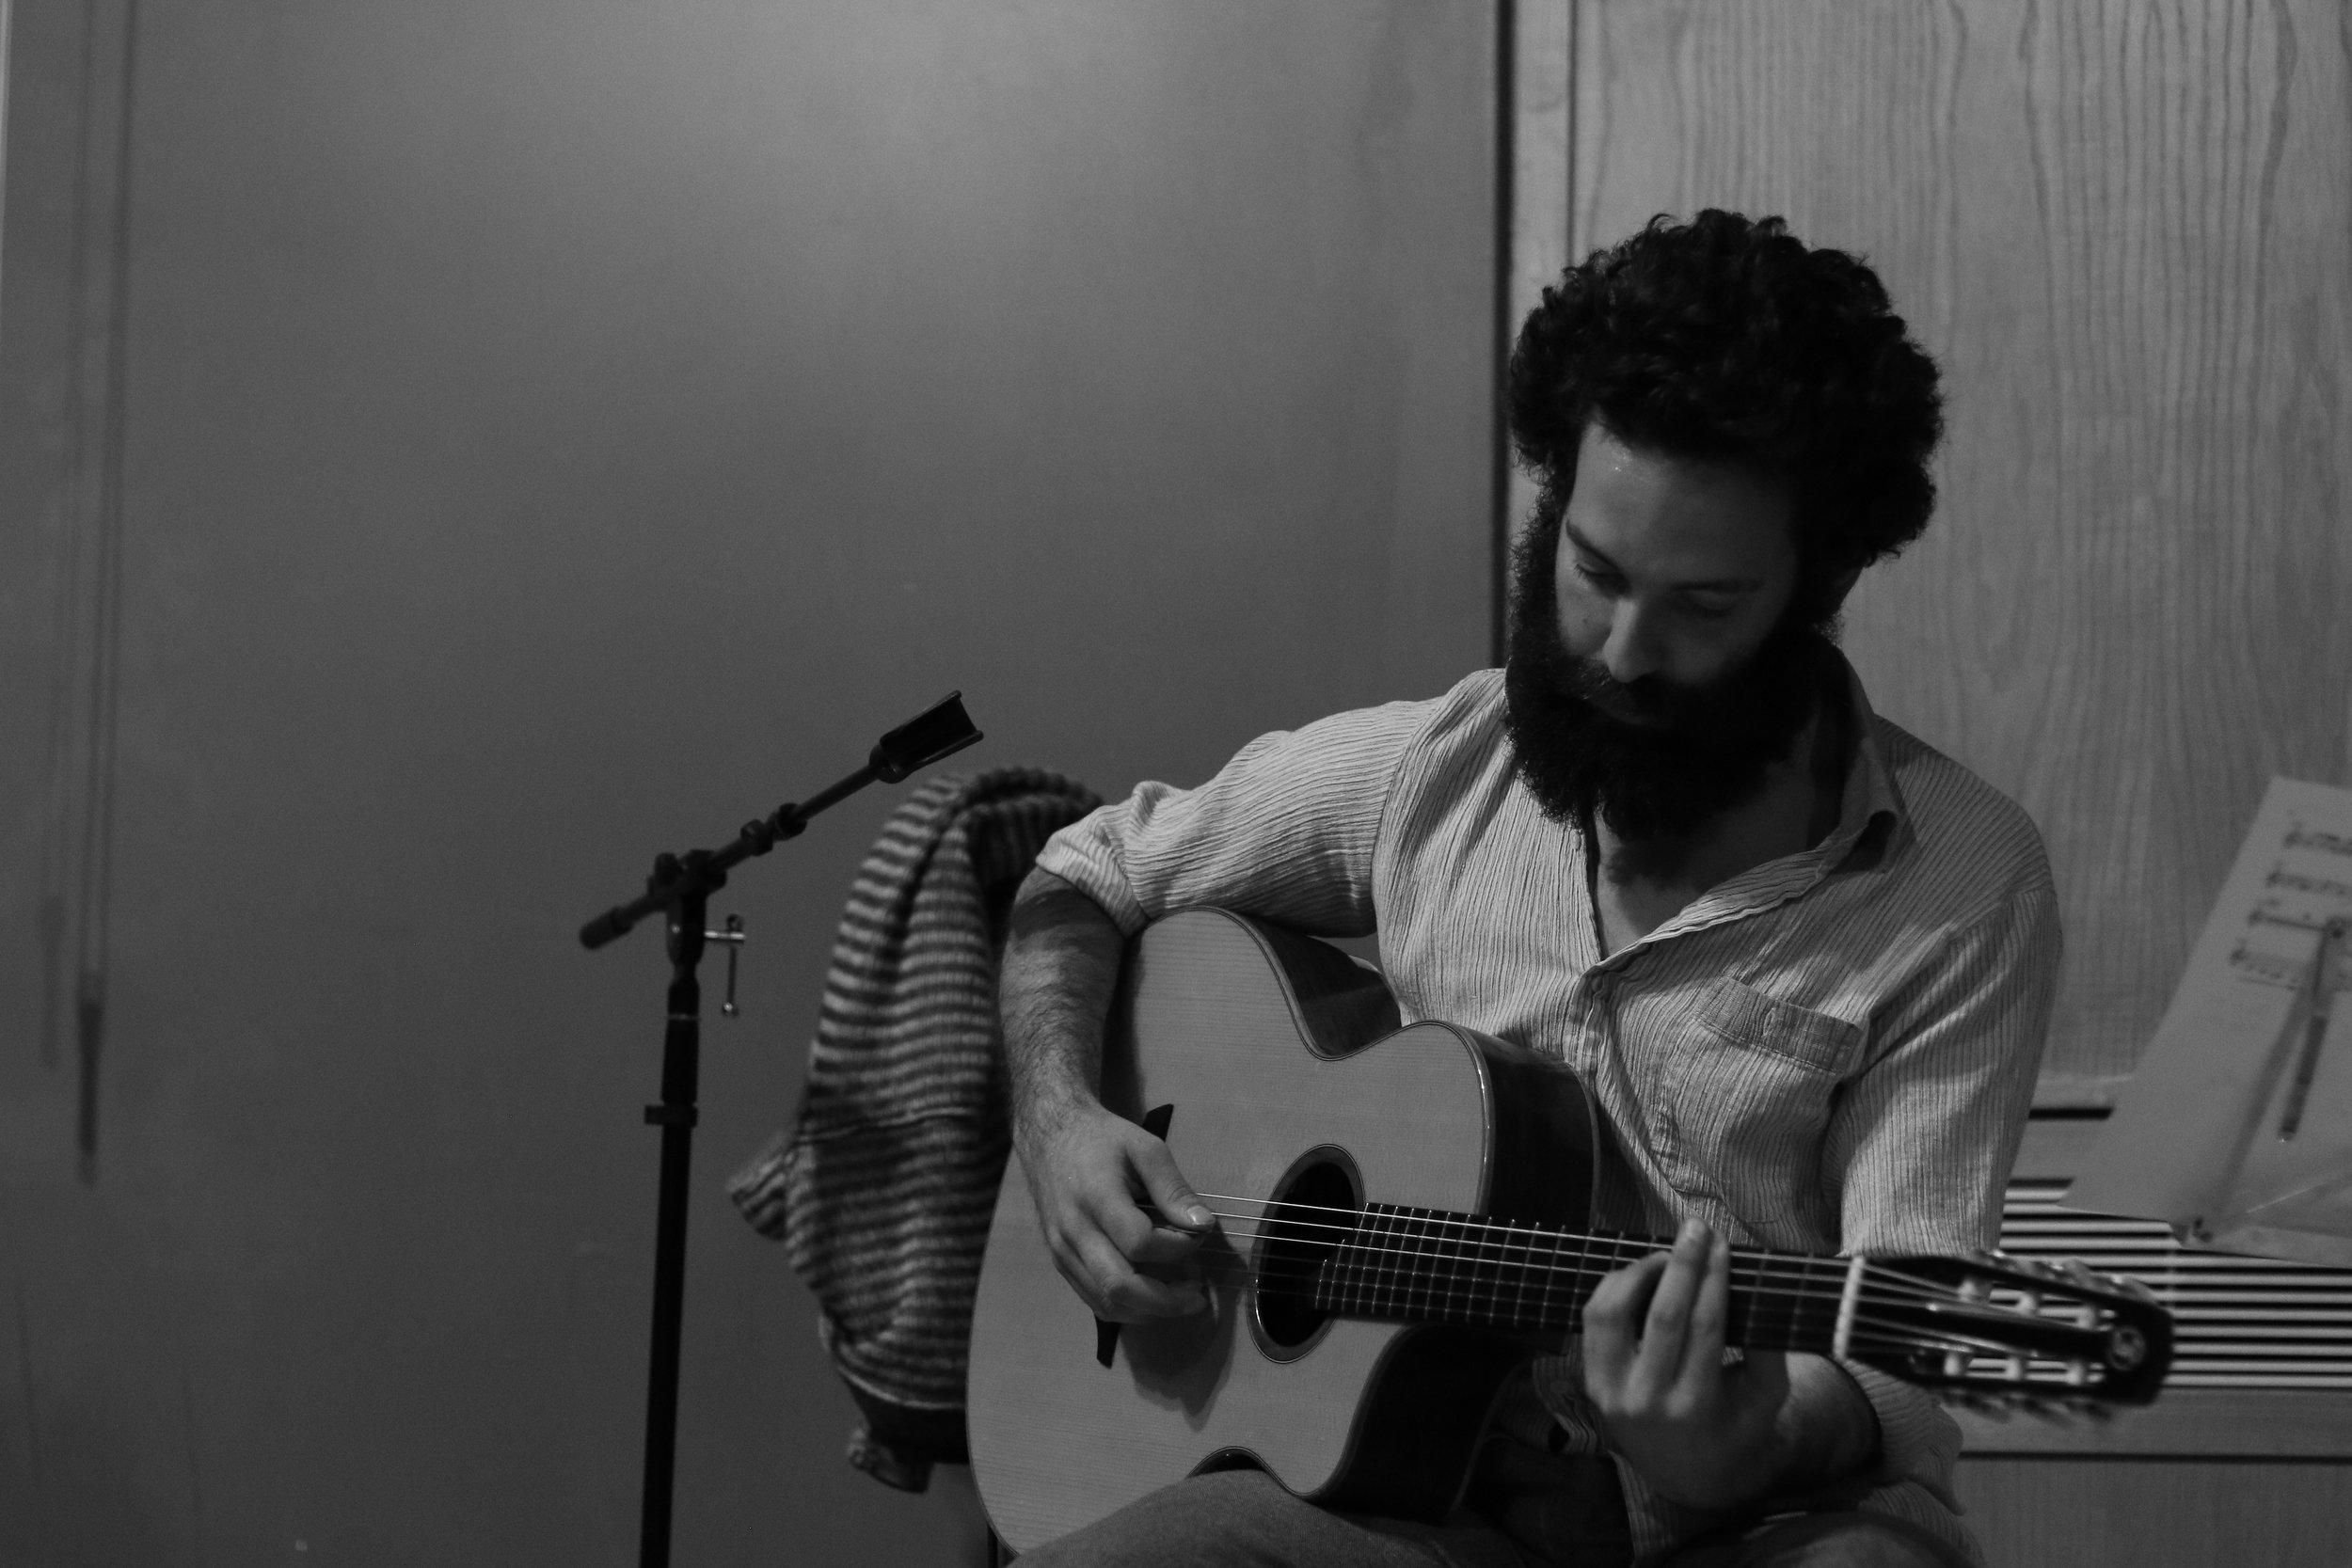 Tim Karp playing music at An Evening of Norse Mythology. Photo by Jordan Laith Rawi.